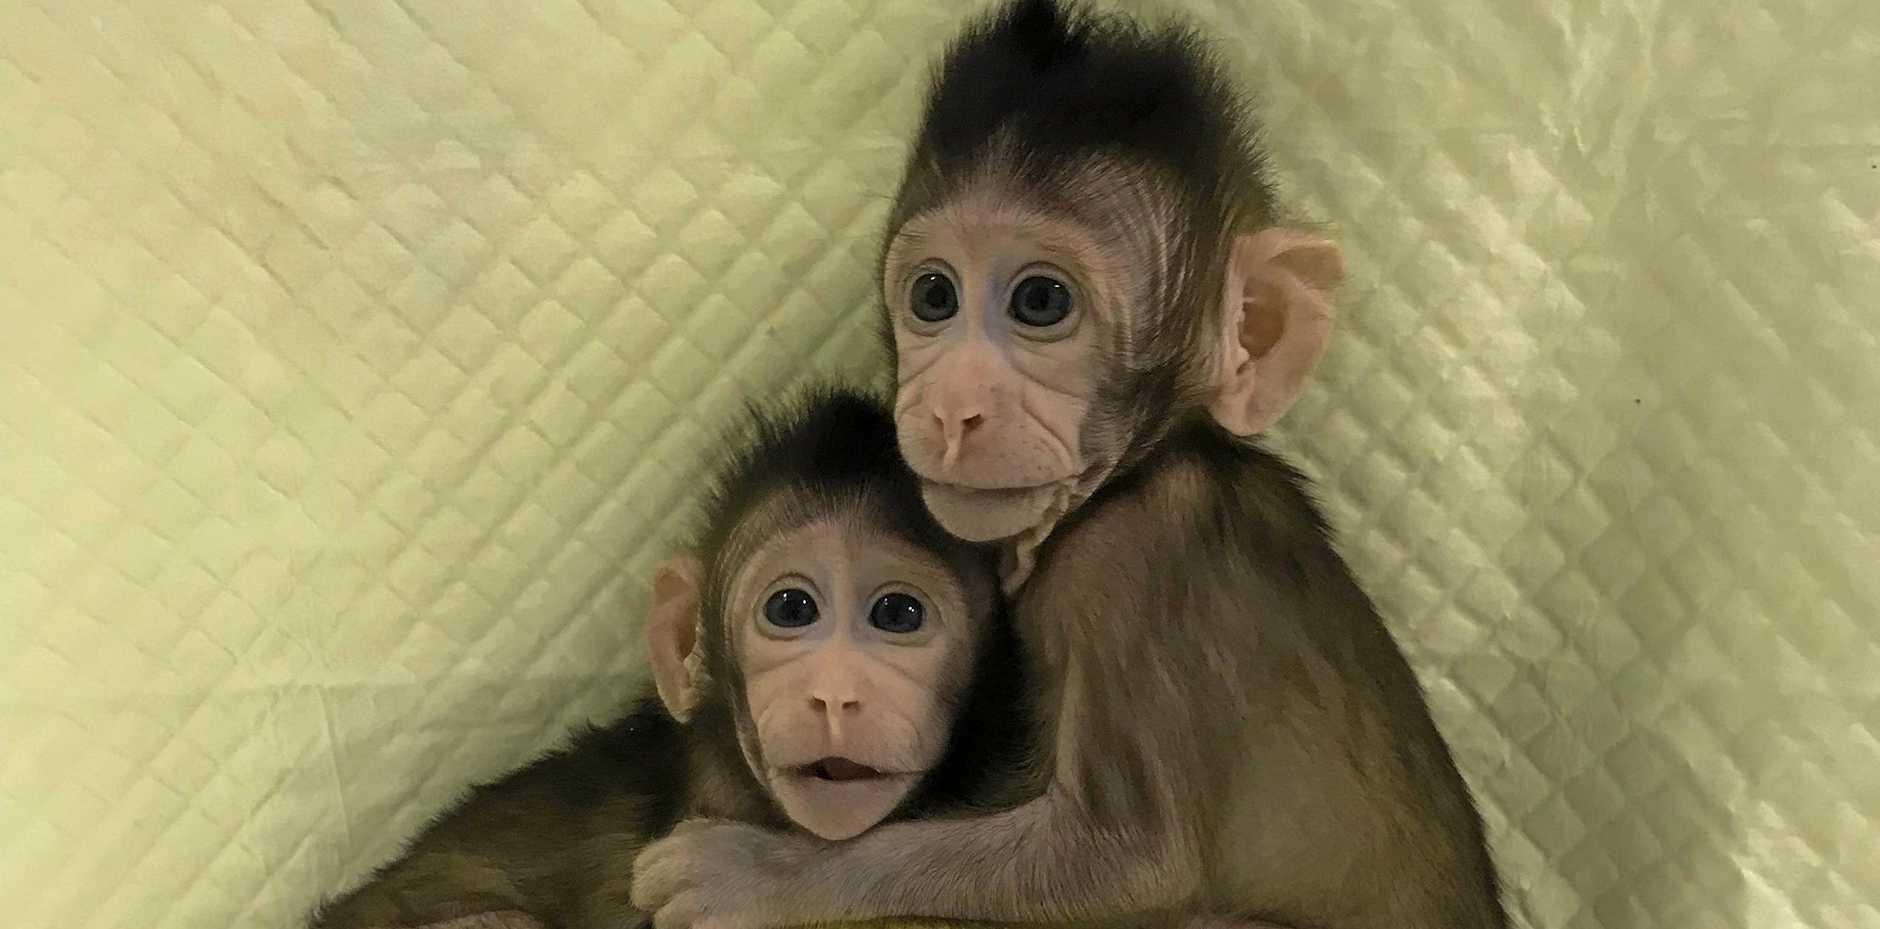 Cloned monkeys Zhong Zhong and Hua Hua appear to be developing normally.